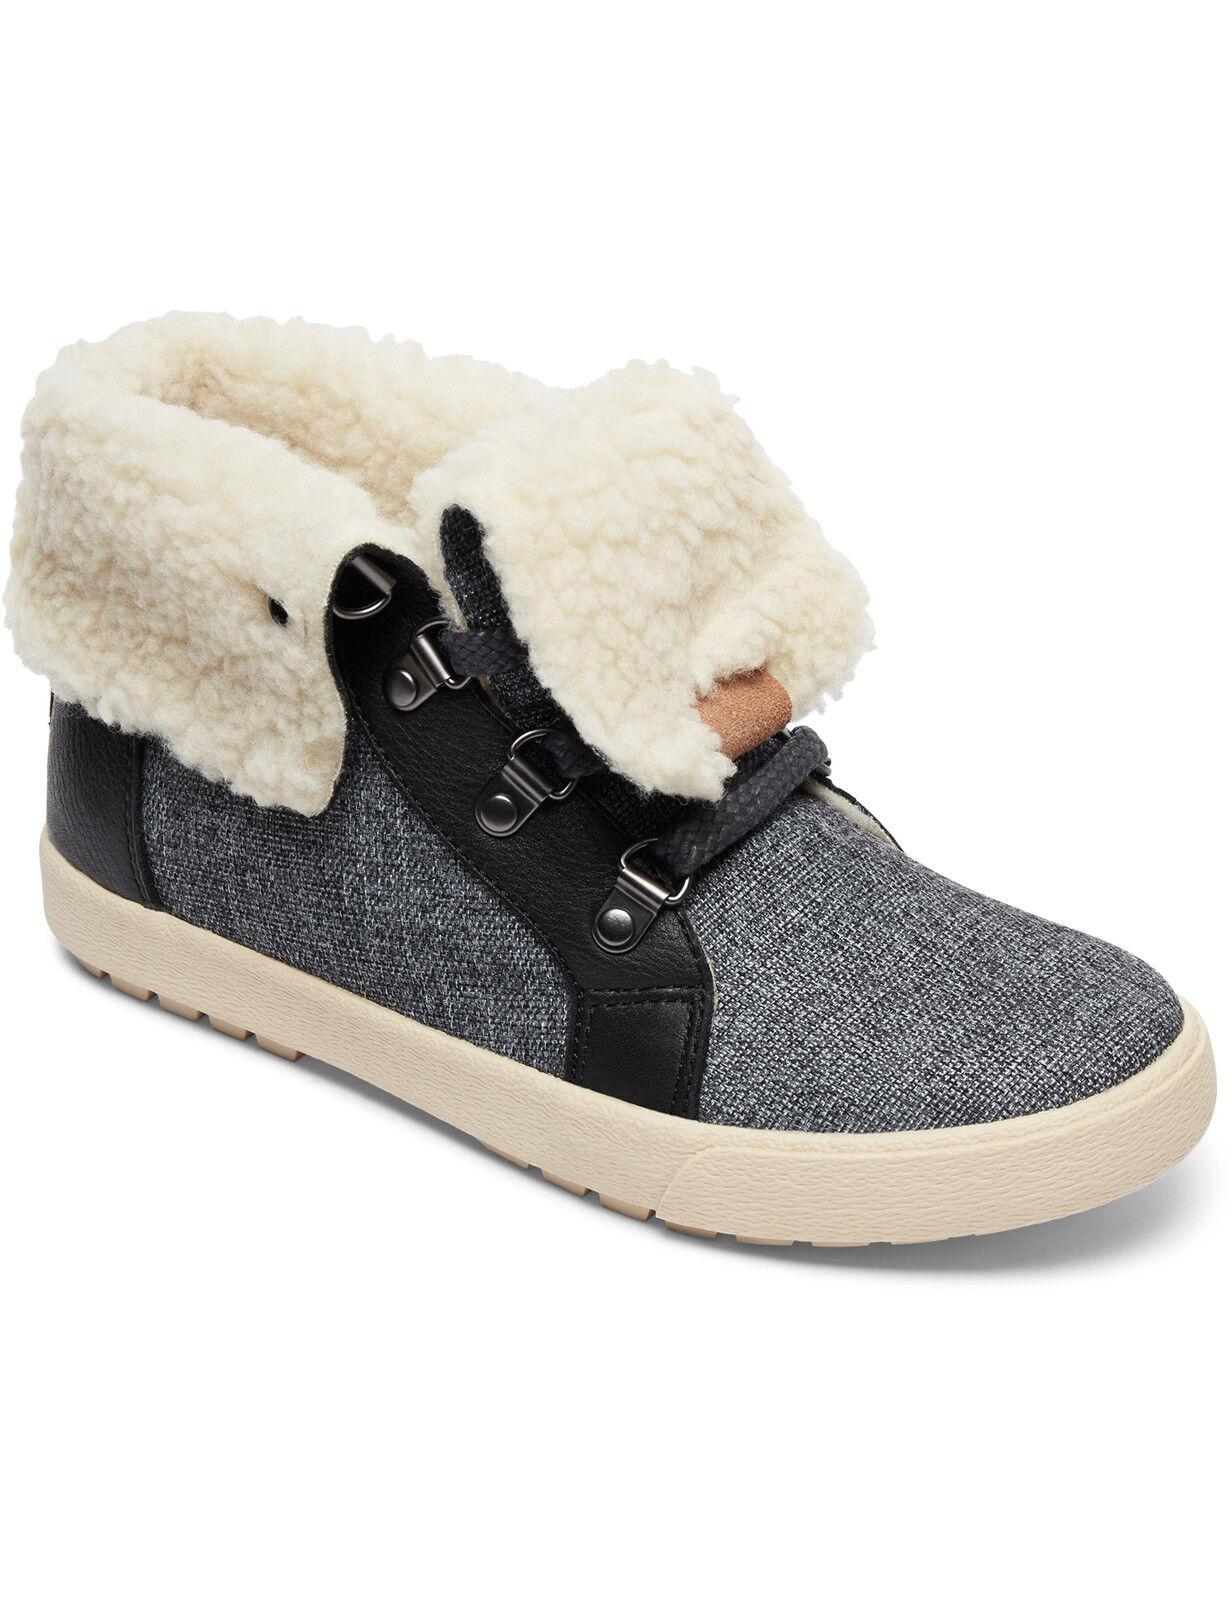 Roxy Albany Moda Botas en carbón